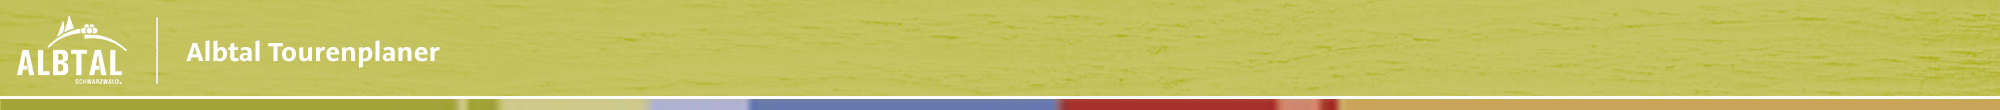 LogoAlbtal.erleben